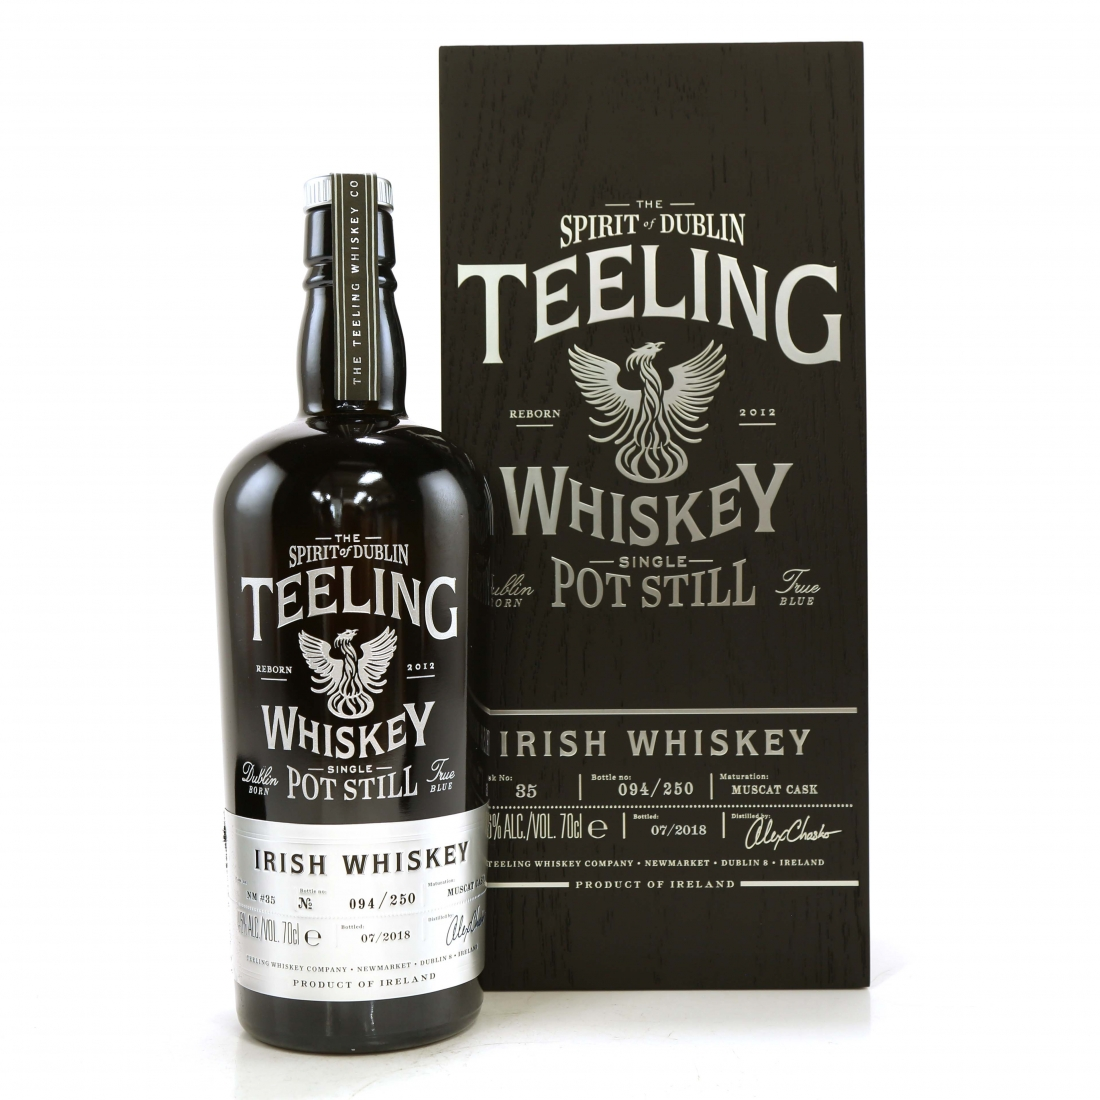 Teeling Celebratory Single Pot Still Whiskey / Bottle #094